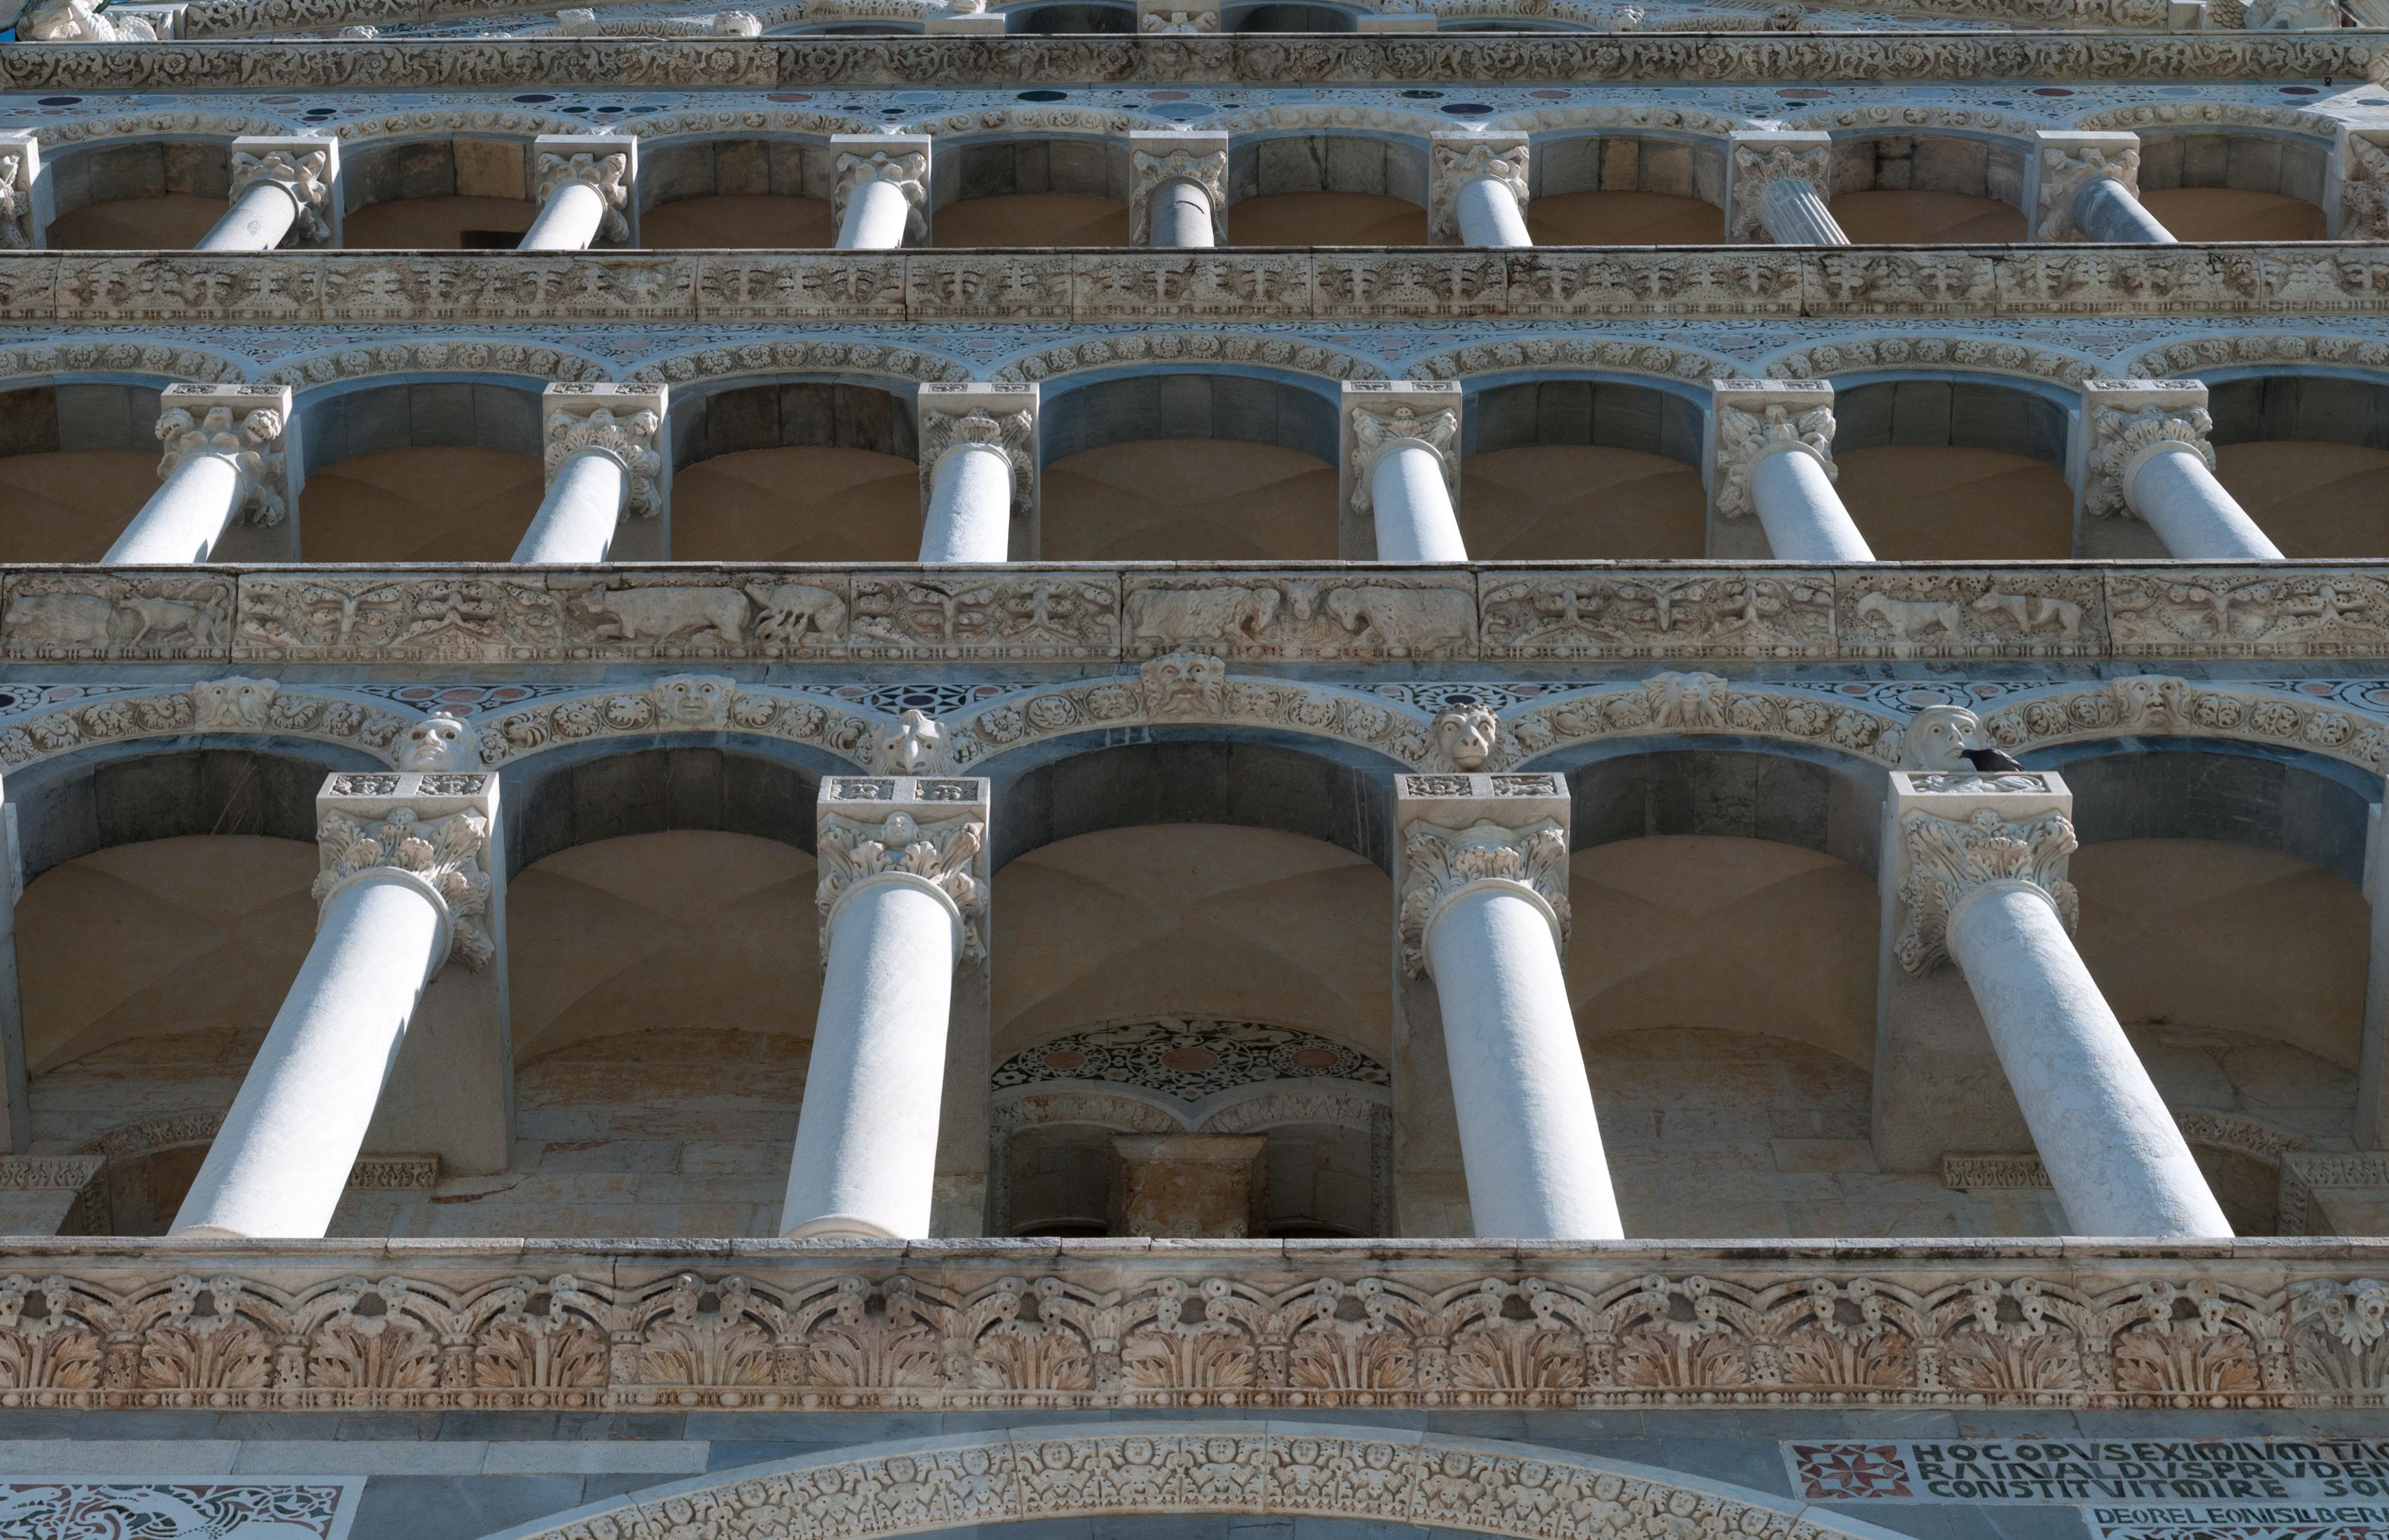 Pisa Cathedral galleries viewed from below